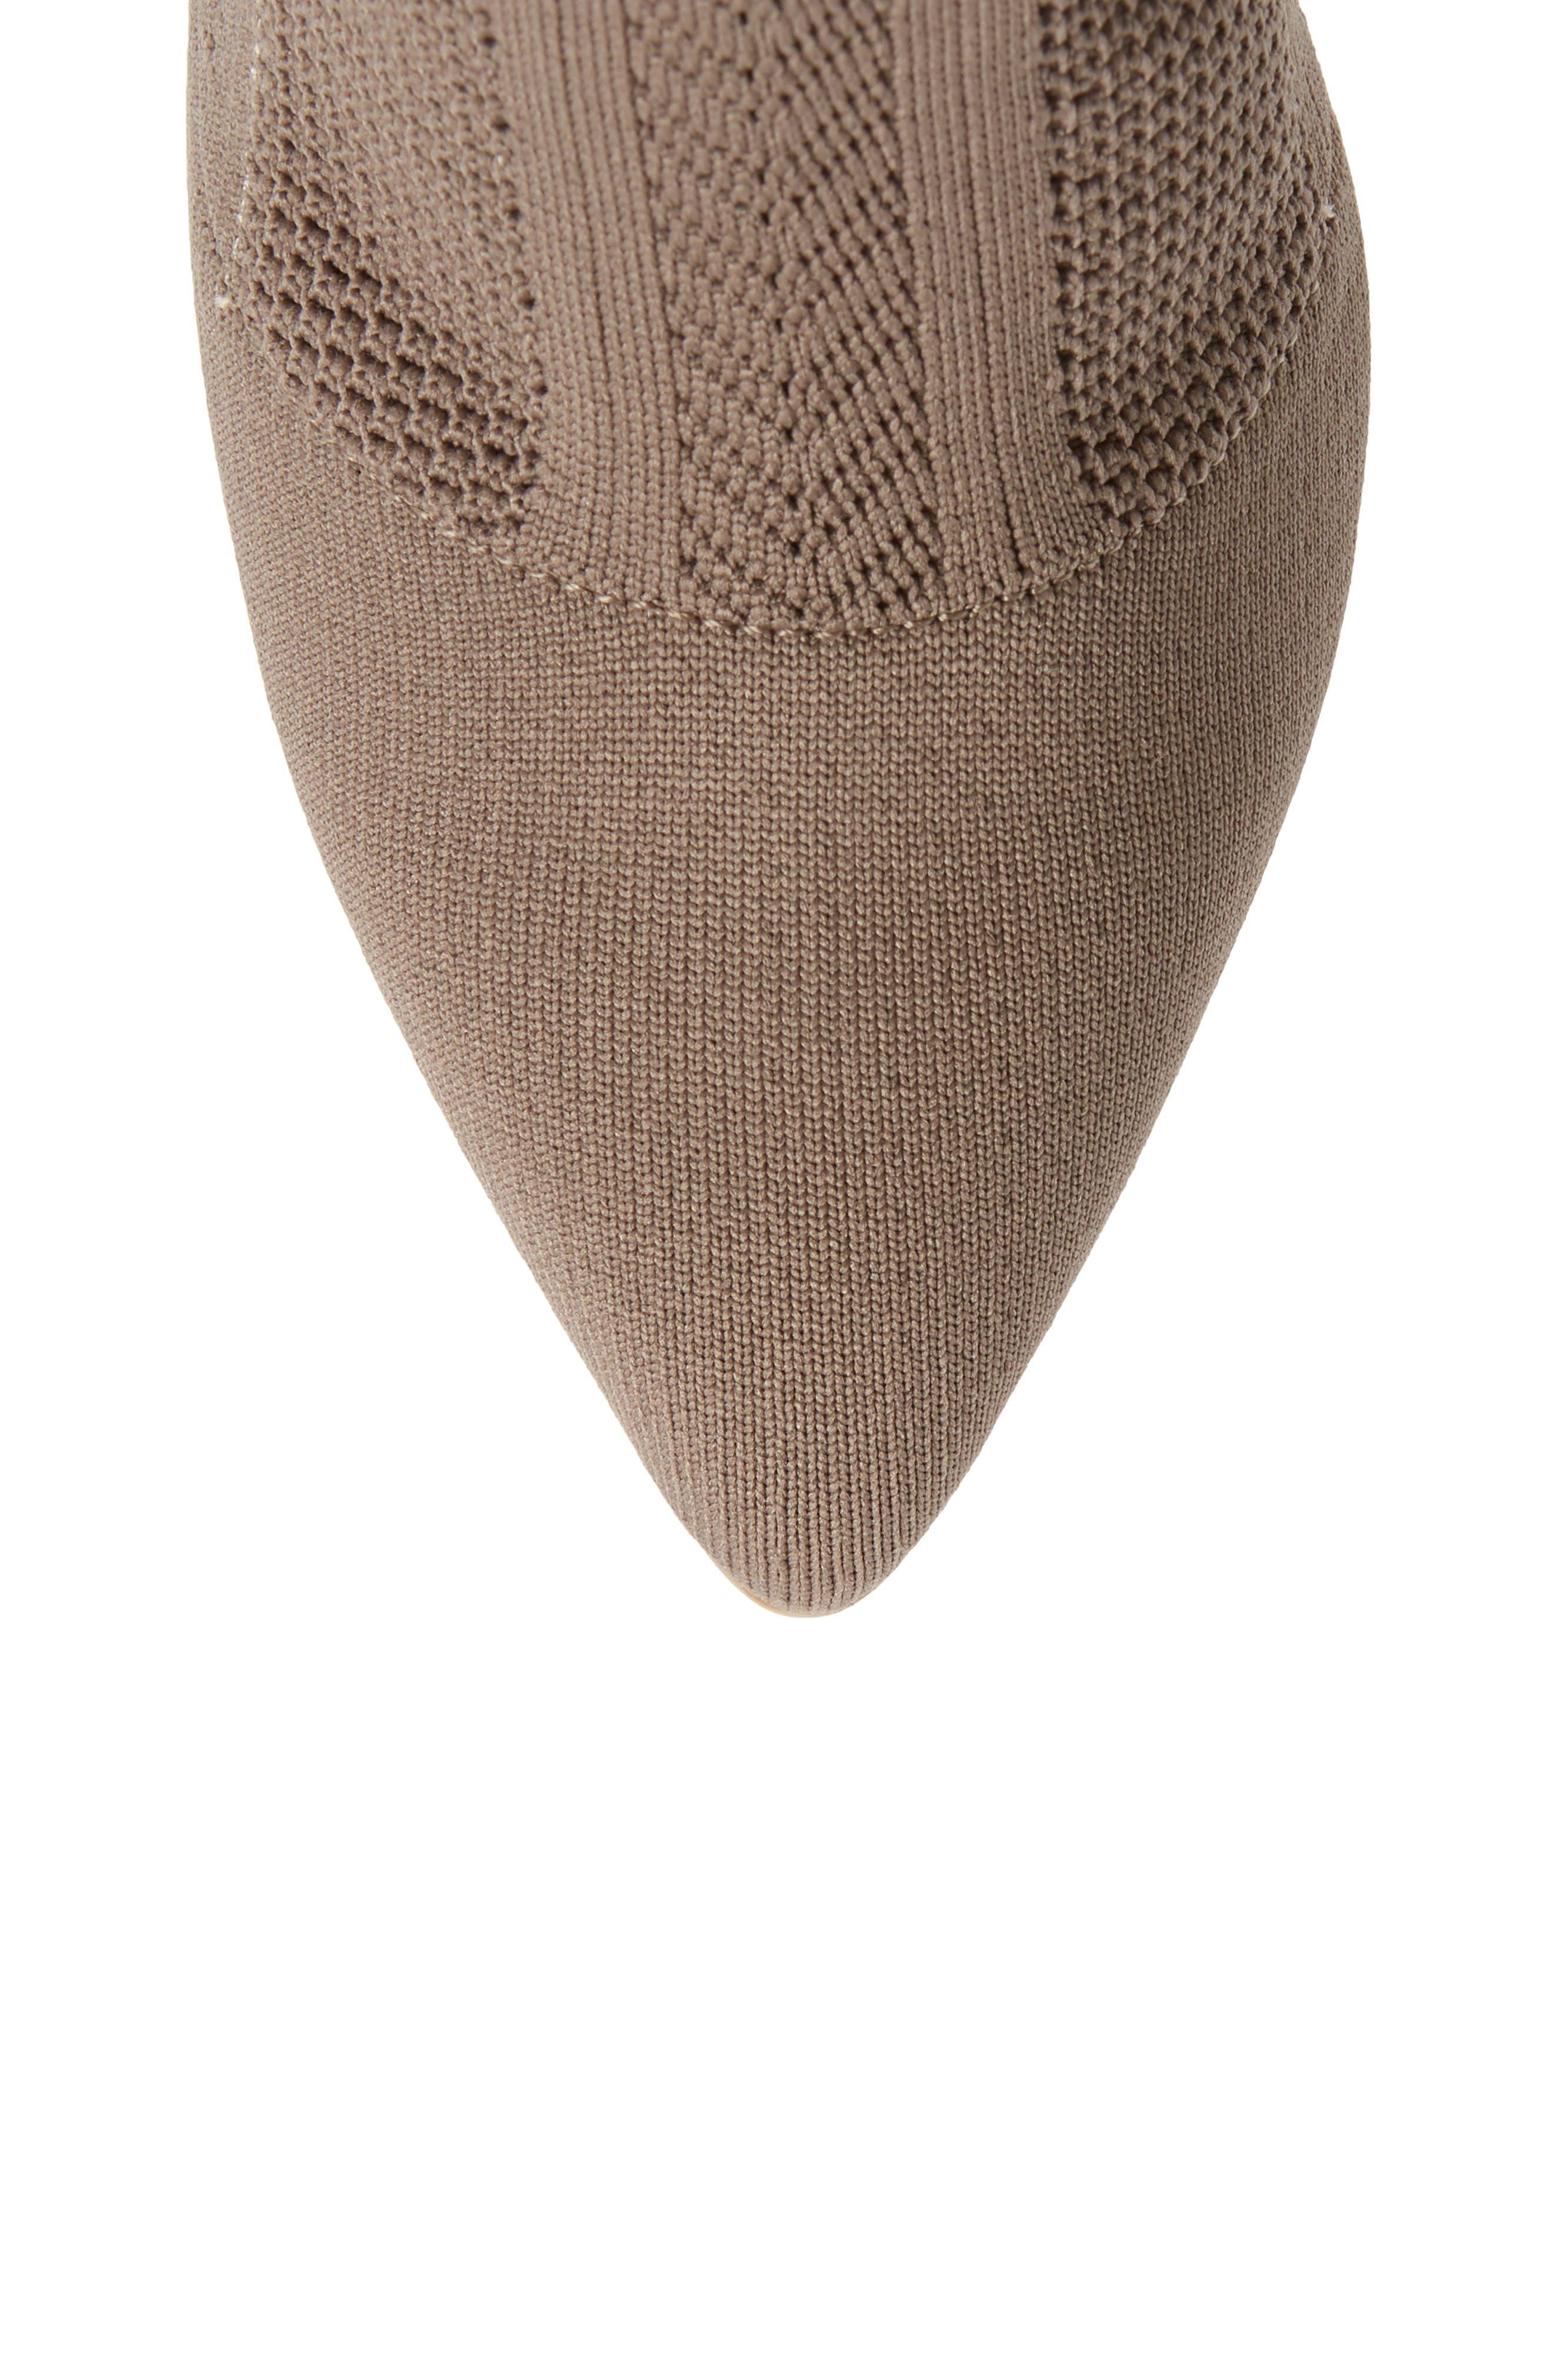 Davis Knit Boot,                             Alternate thumbnail 5, color,                             020